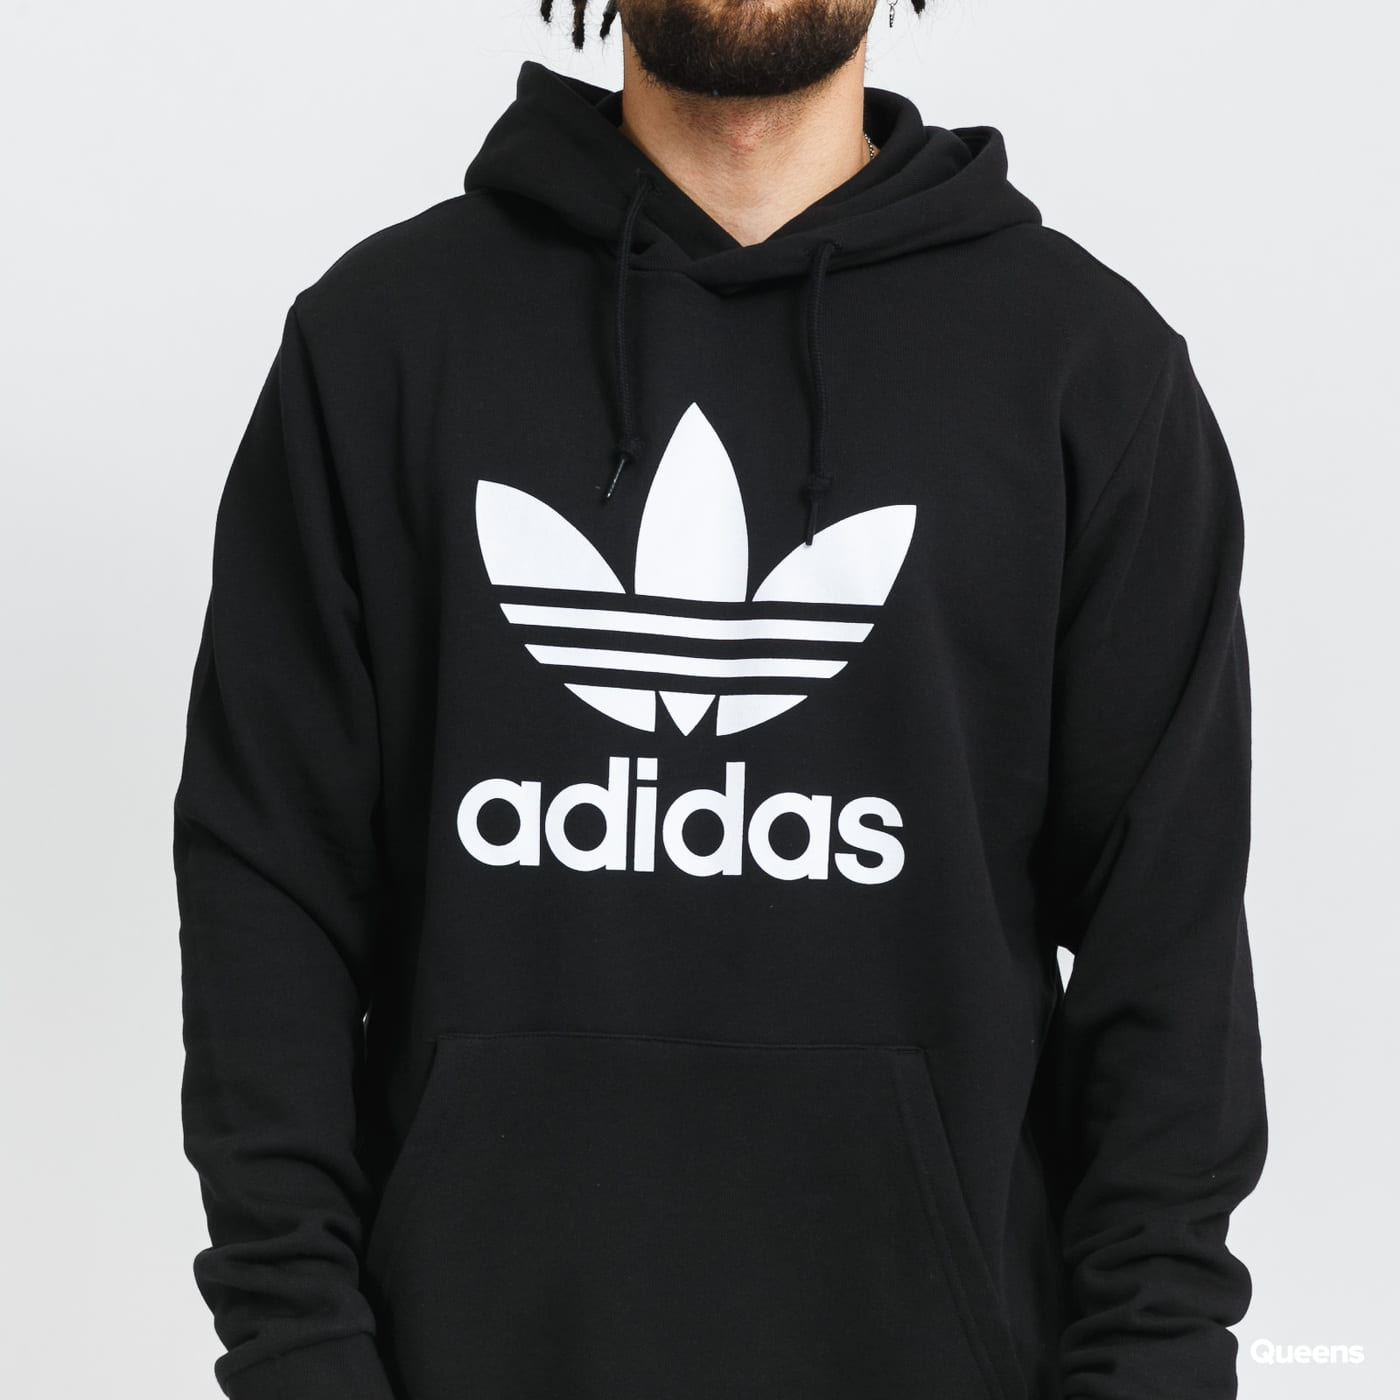 adidas Originals Trefoil Hoody gray / beige / pink / black